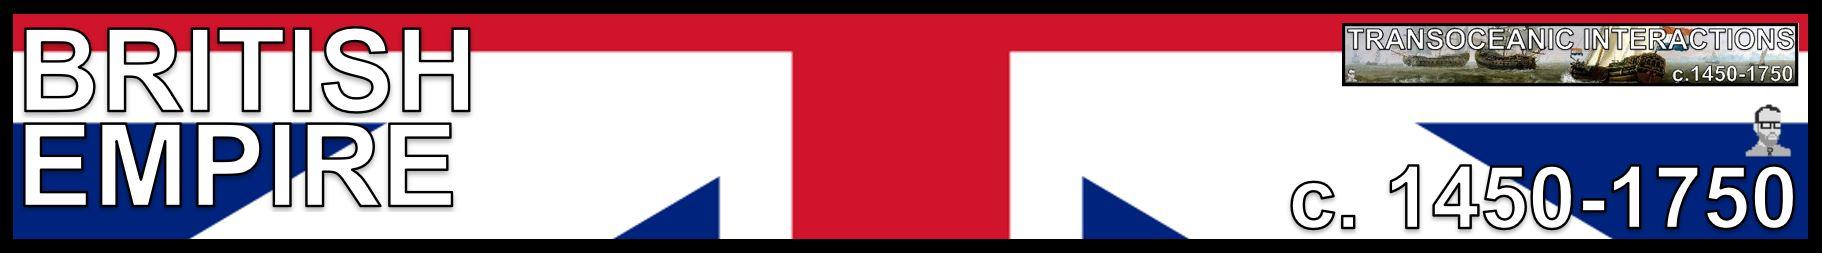 BRITISH FLAG AP WORLD HISTORY MODERN FREEMANPEDIA TRANSOCEANIC INTERACTIONS.JPG